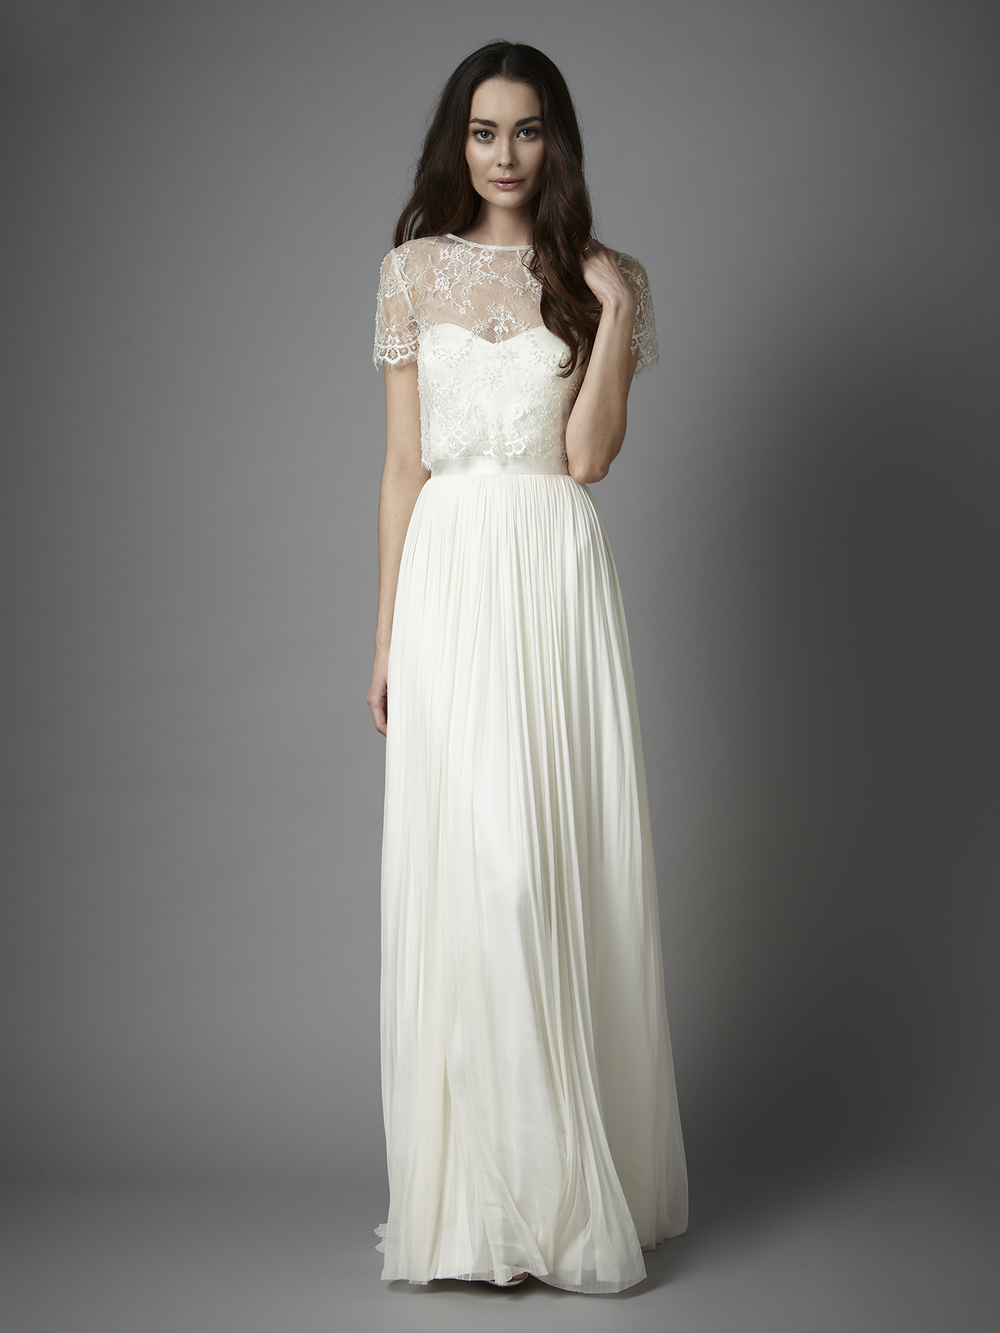 Rachel Ash Bridalwear | Catherine Deane Wedding Dresses